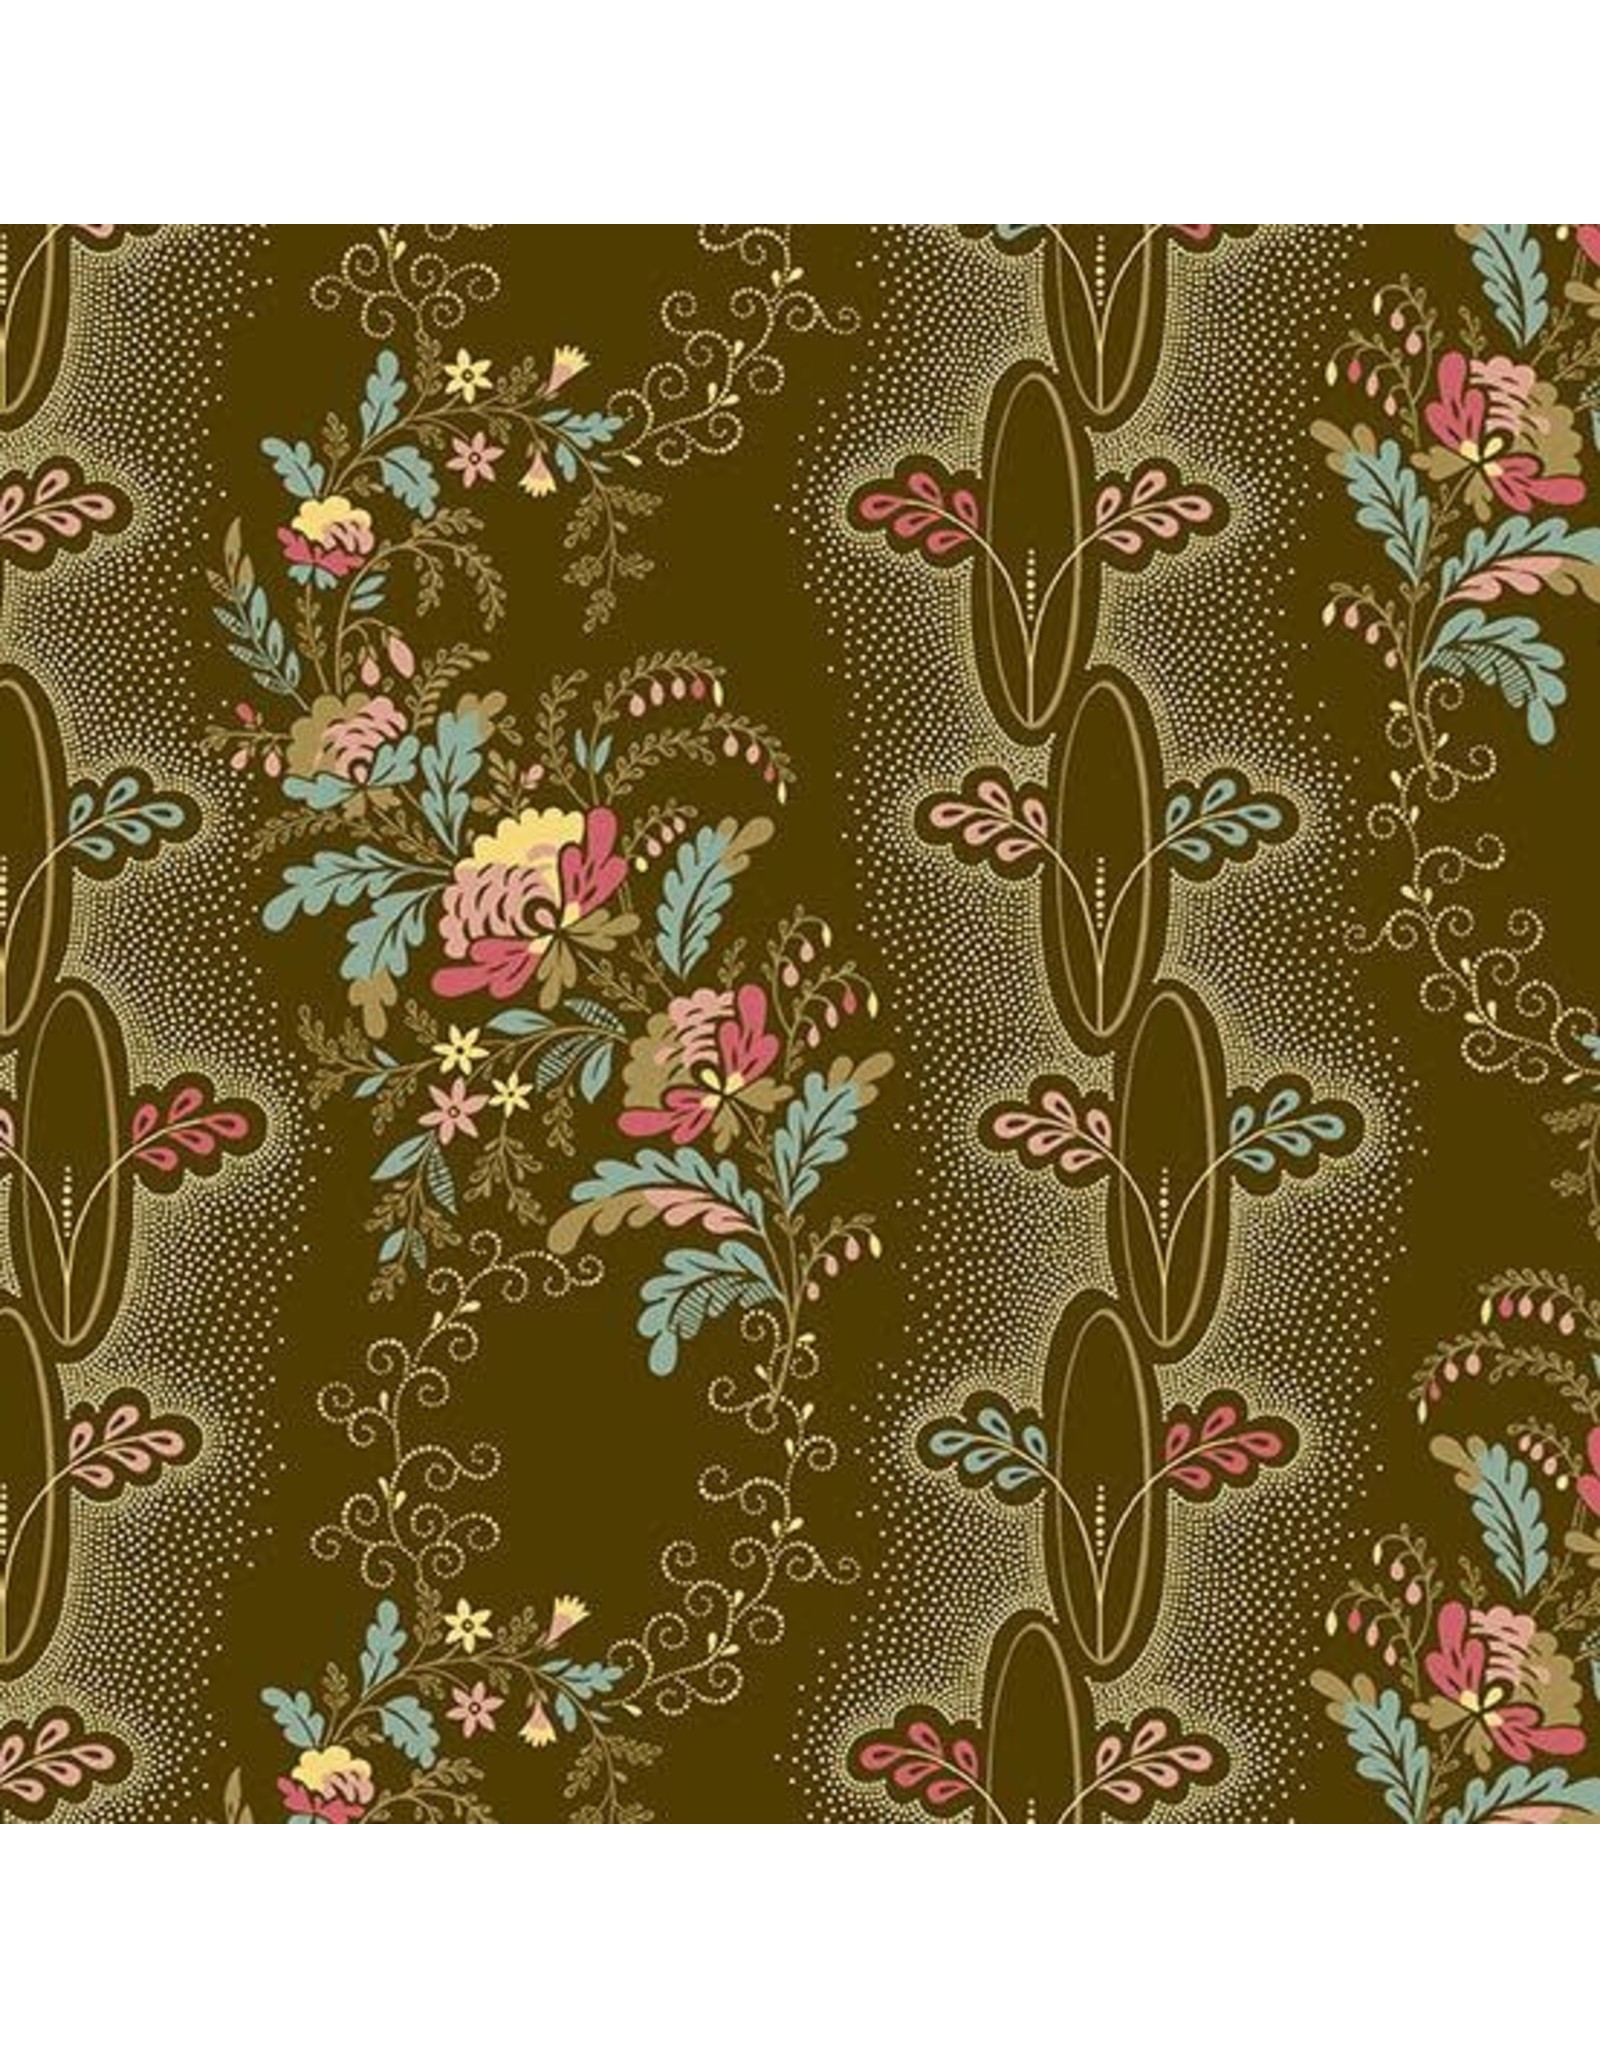 Andover Fabrics ON SALE-Chesapeake, Vine in Brown, Fabric FULL-Yards